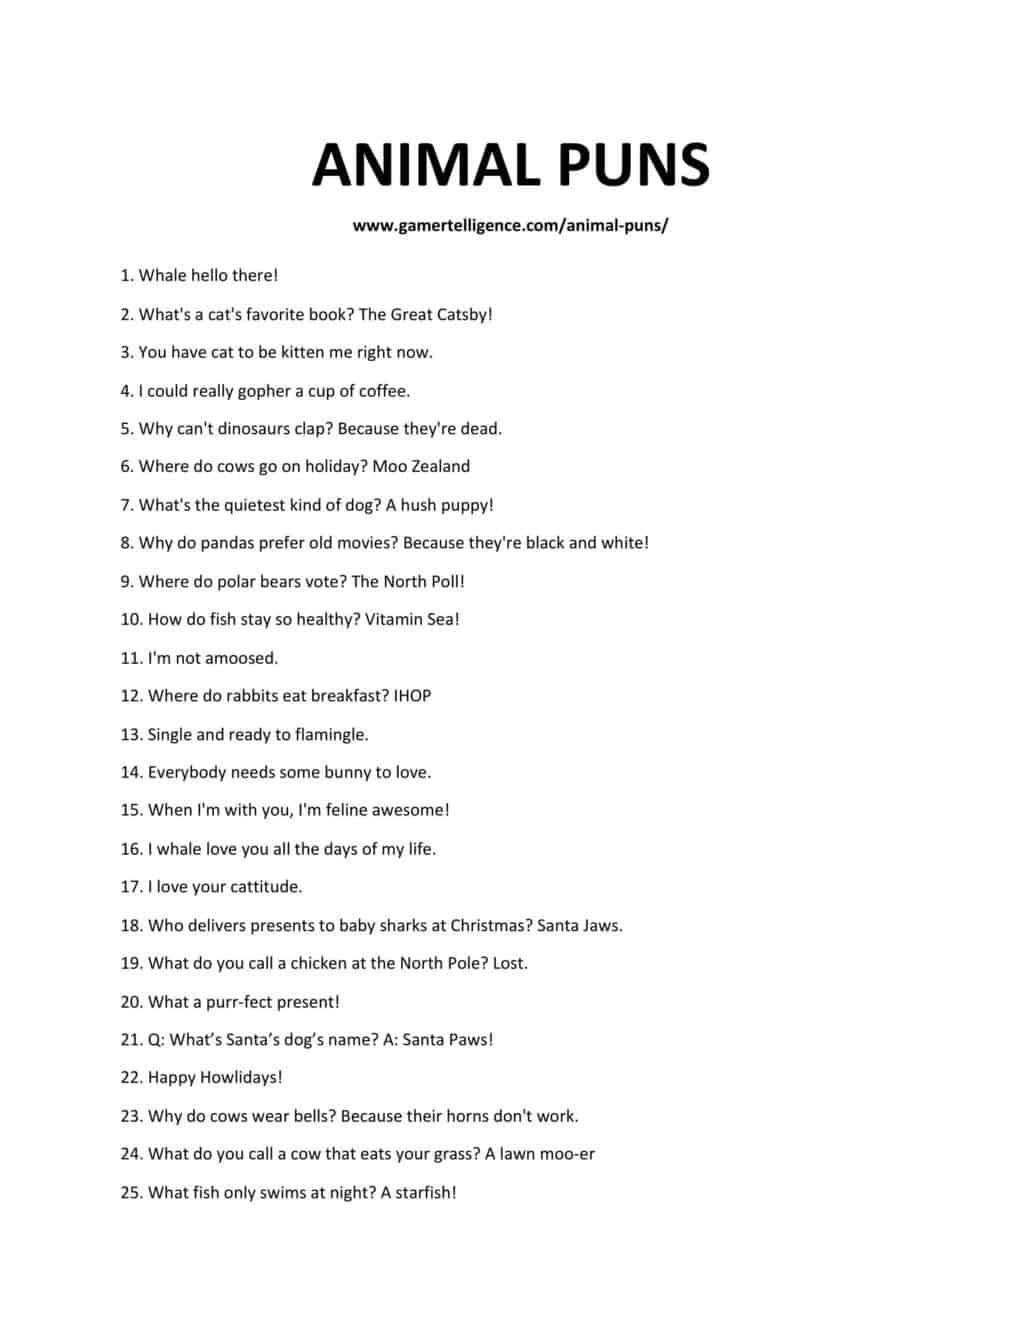 A downloadable list of puns